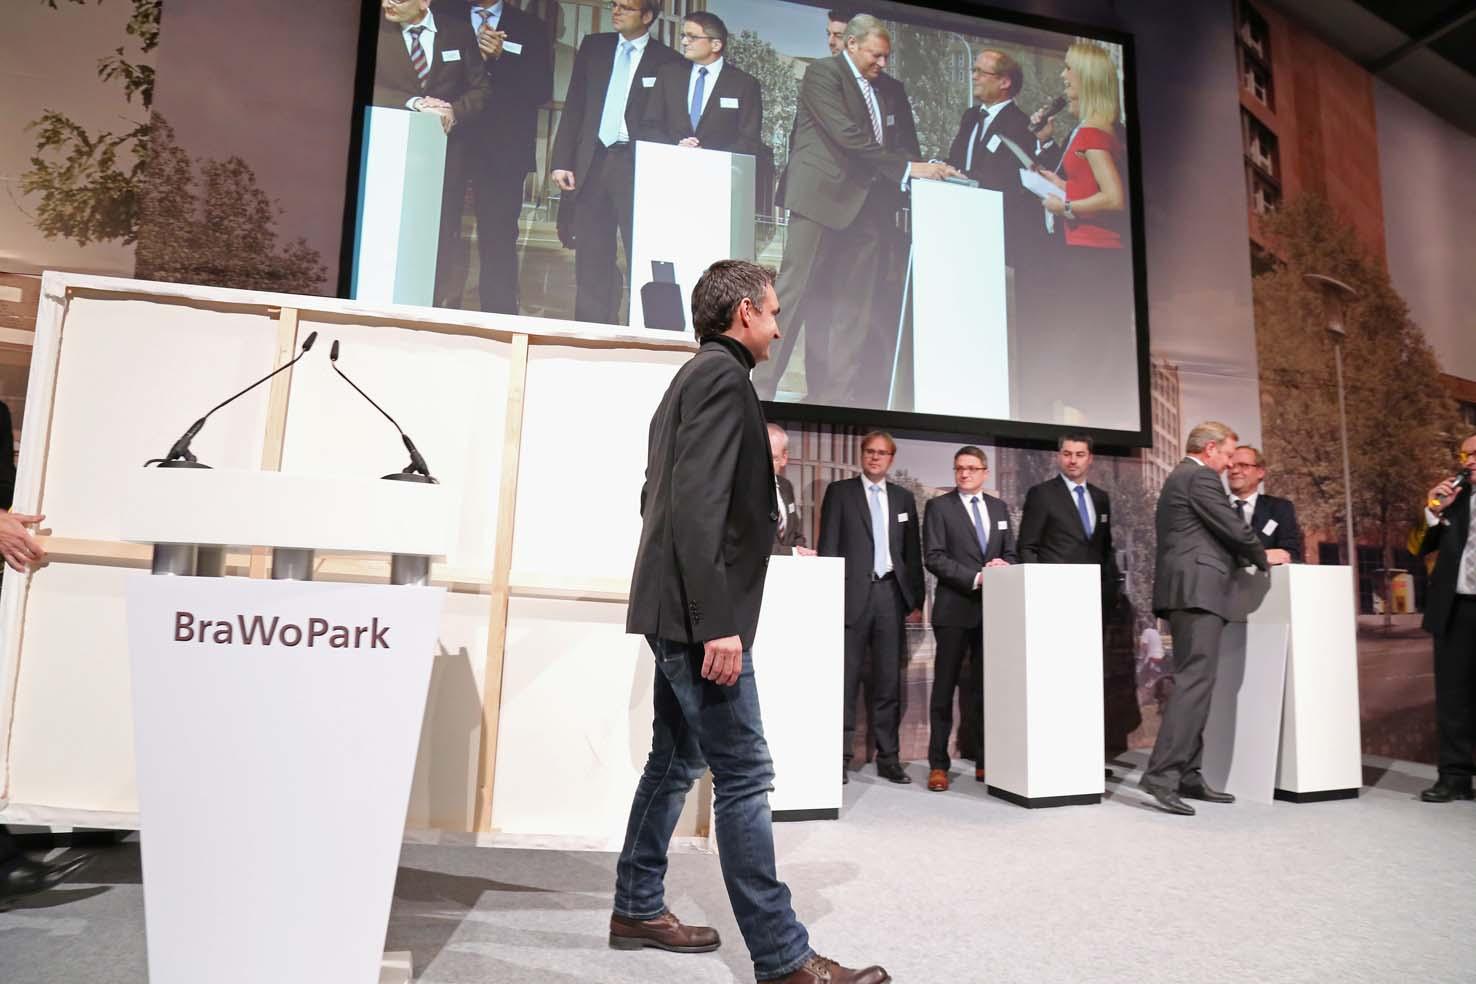 5 - BraWoPark - Dirk Wink-Hartmann